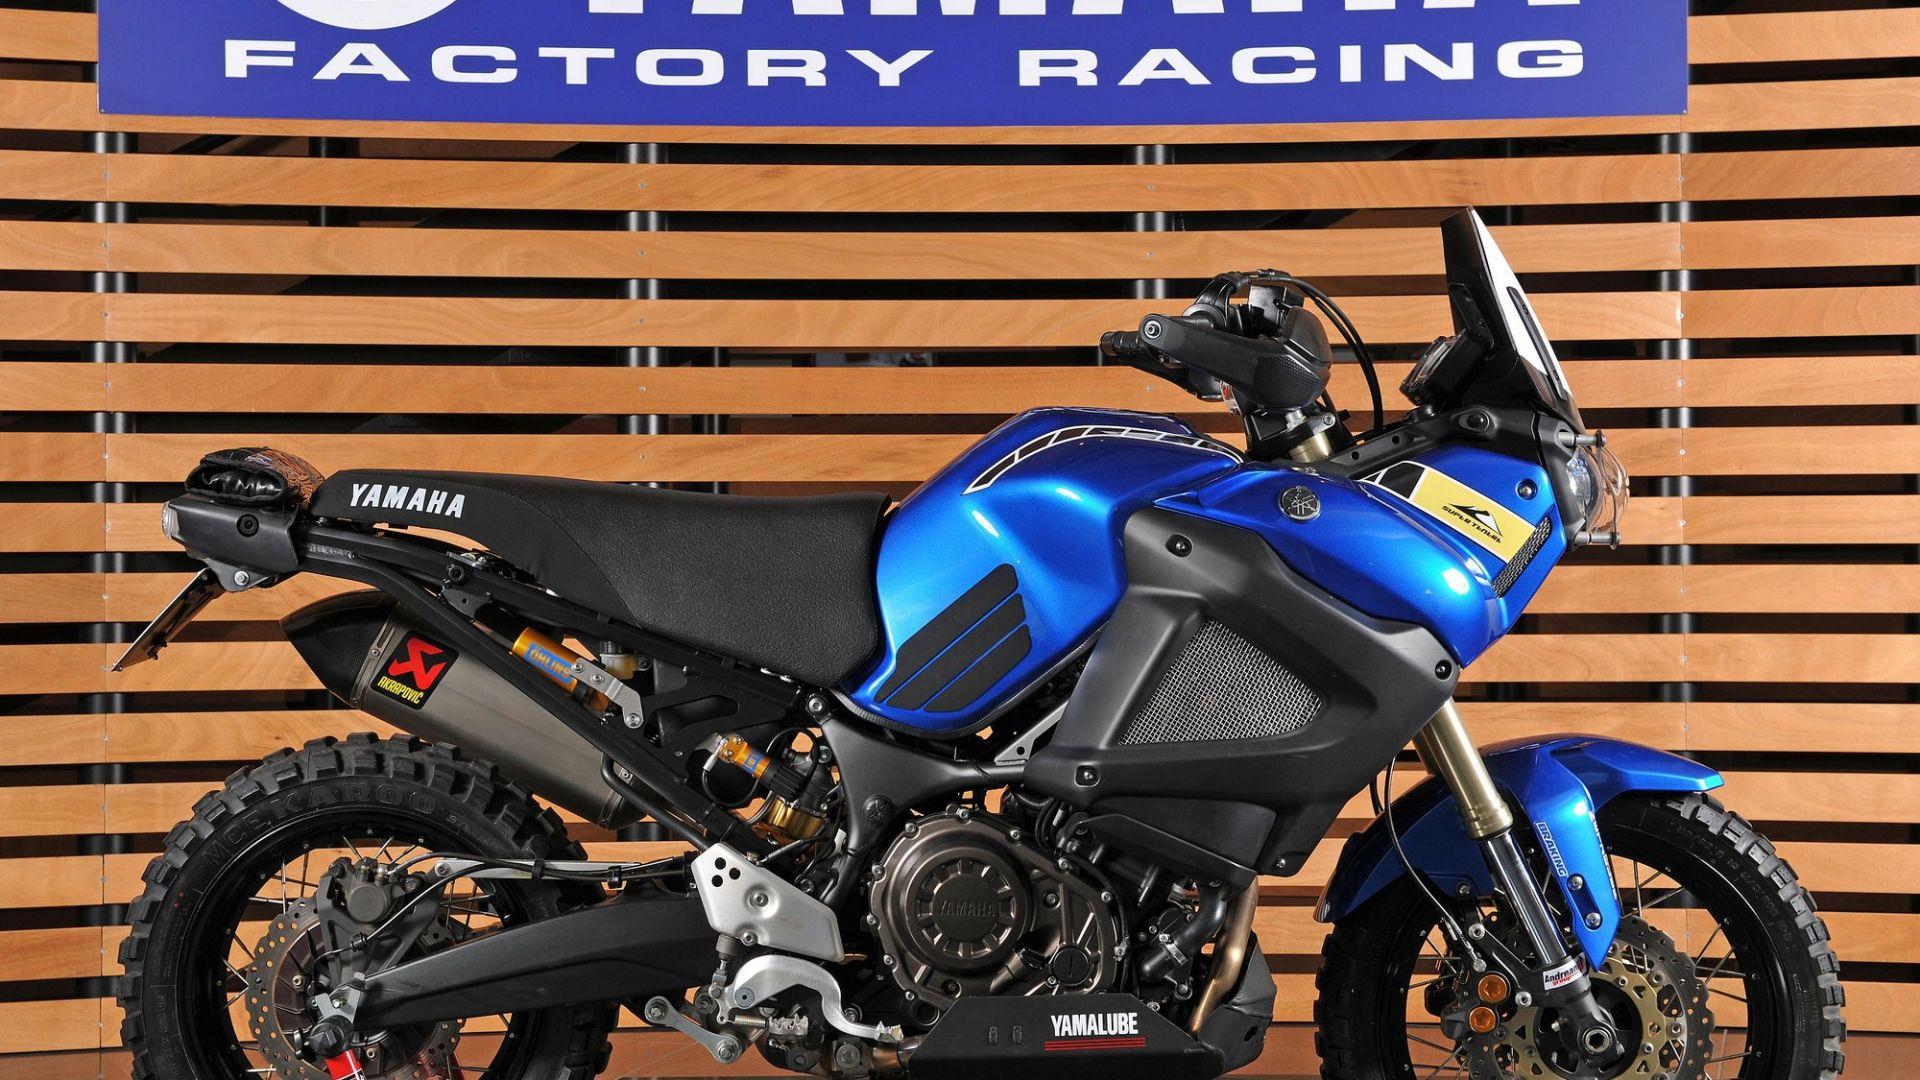 Immagine 0: Yamaha Super Ténéré XTZ1200 R